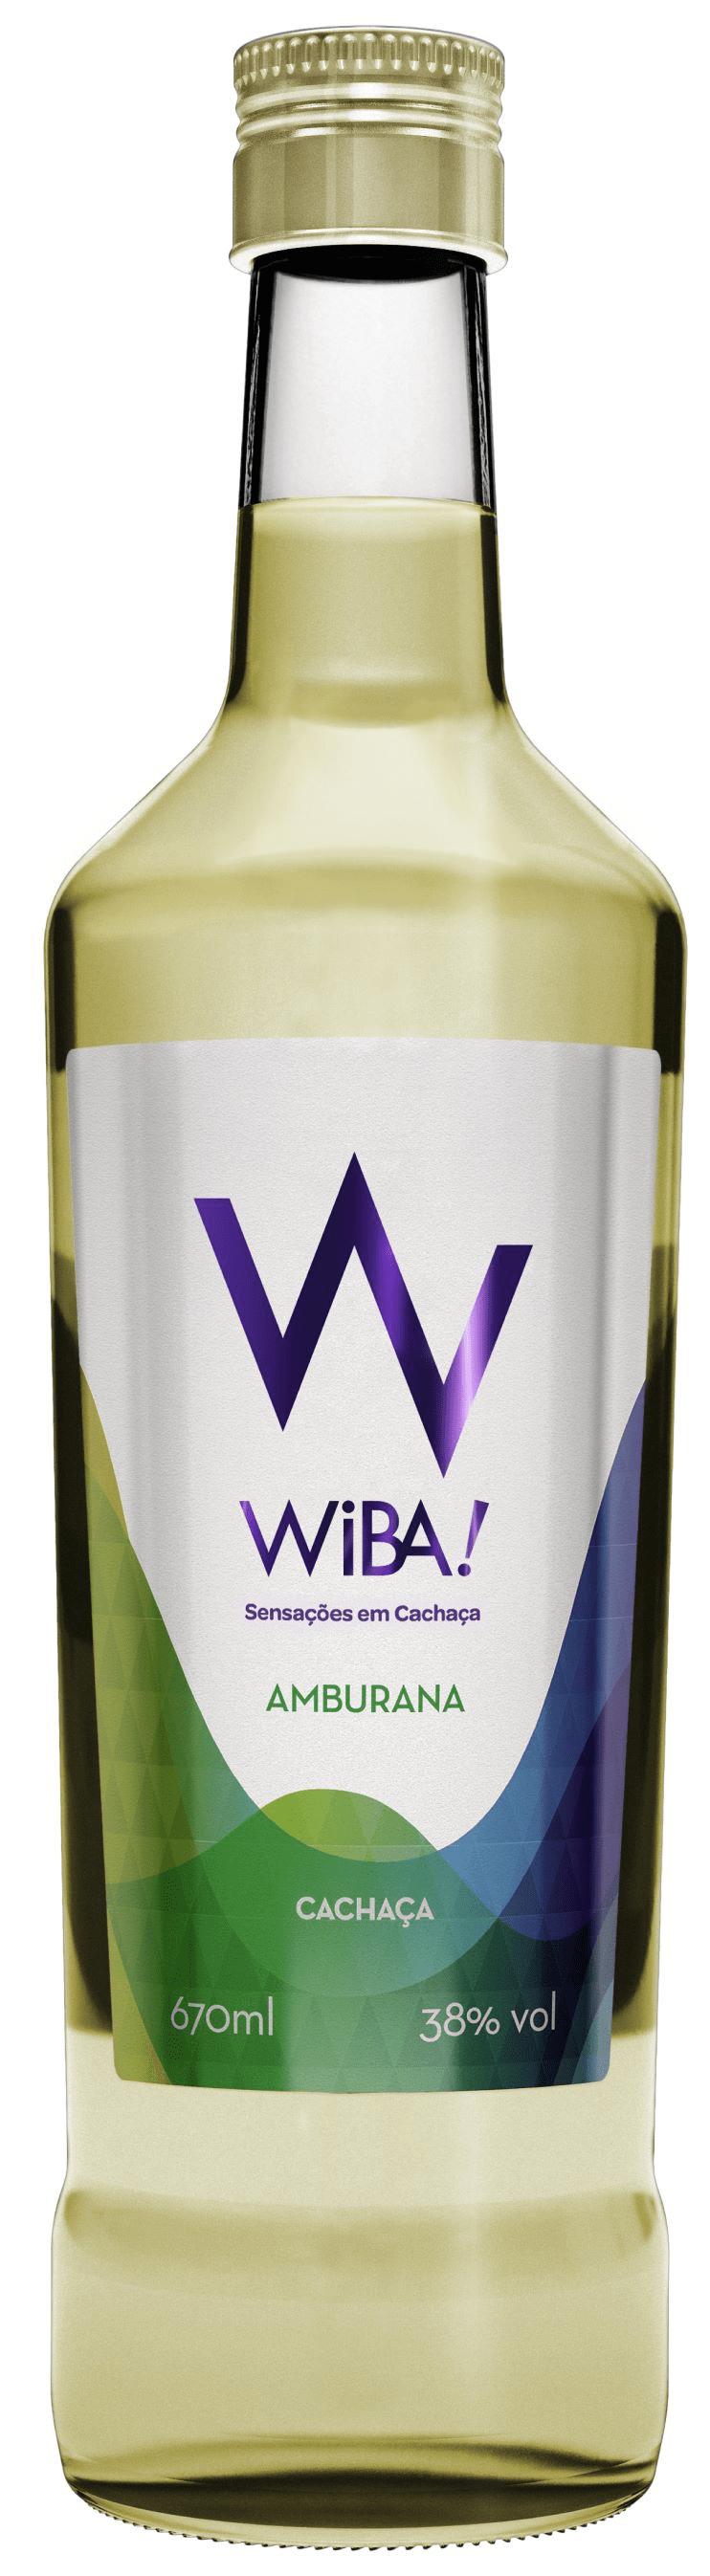 Cachaça WIBA Amburana Ouro - 670 ml